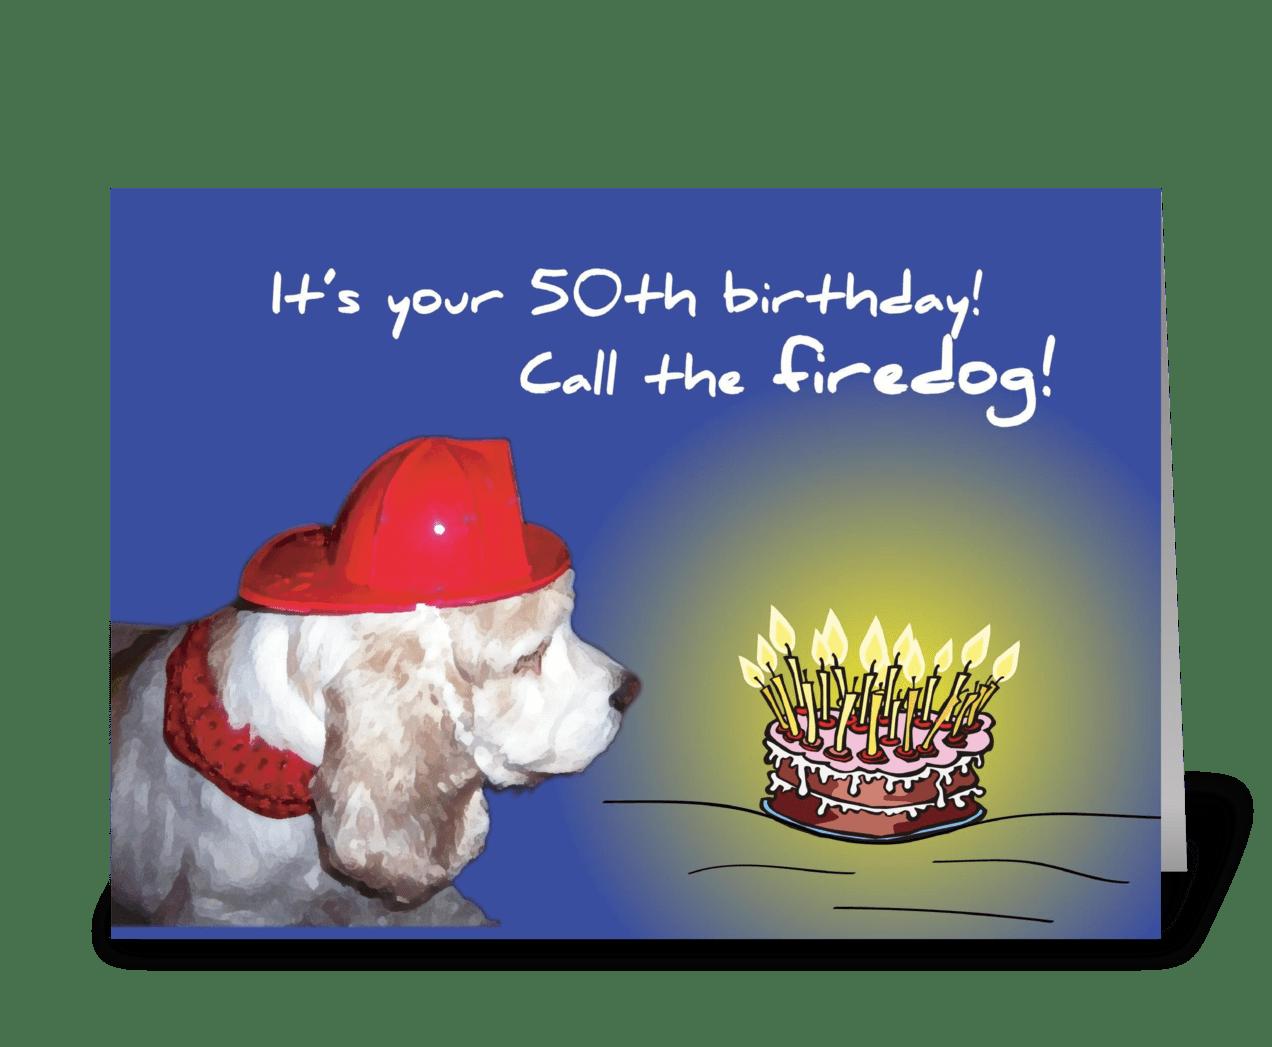 50th Birthday Fire Dog